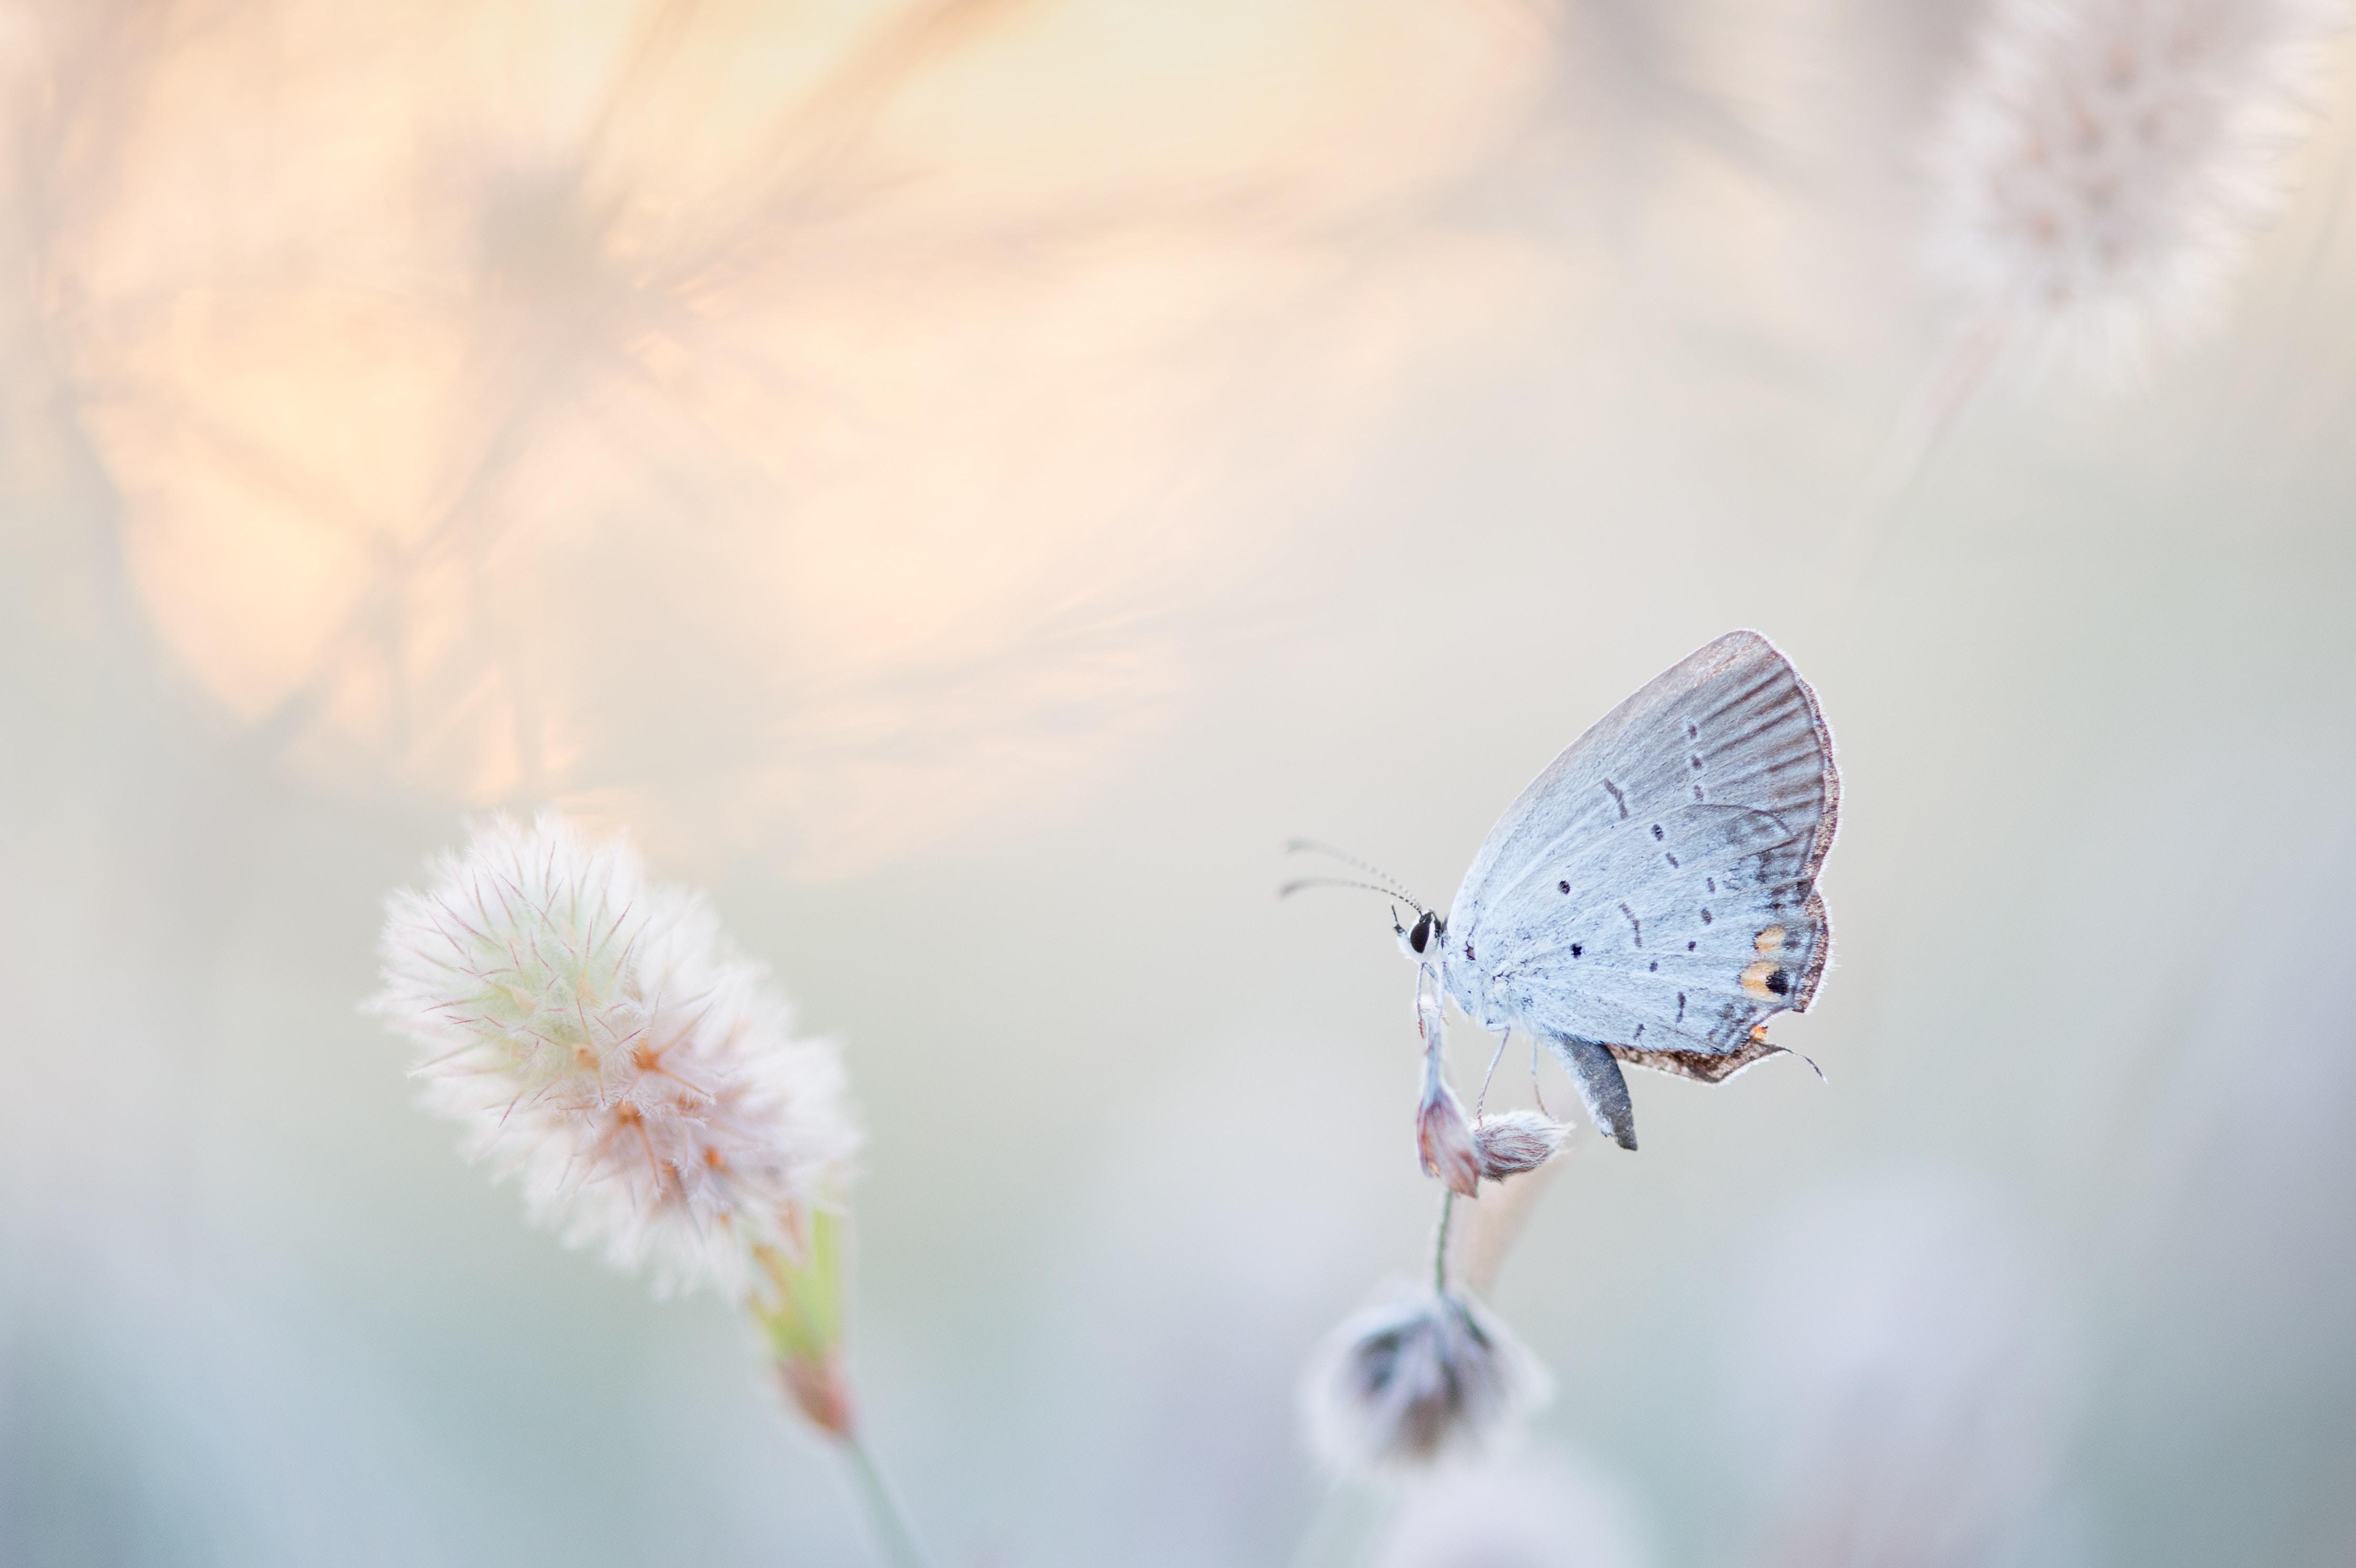 ijsvlinder